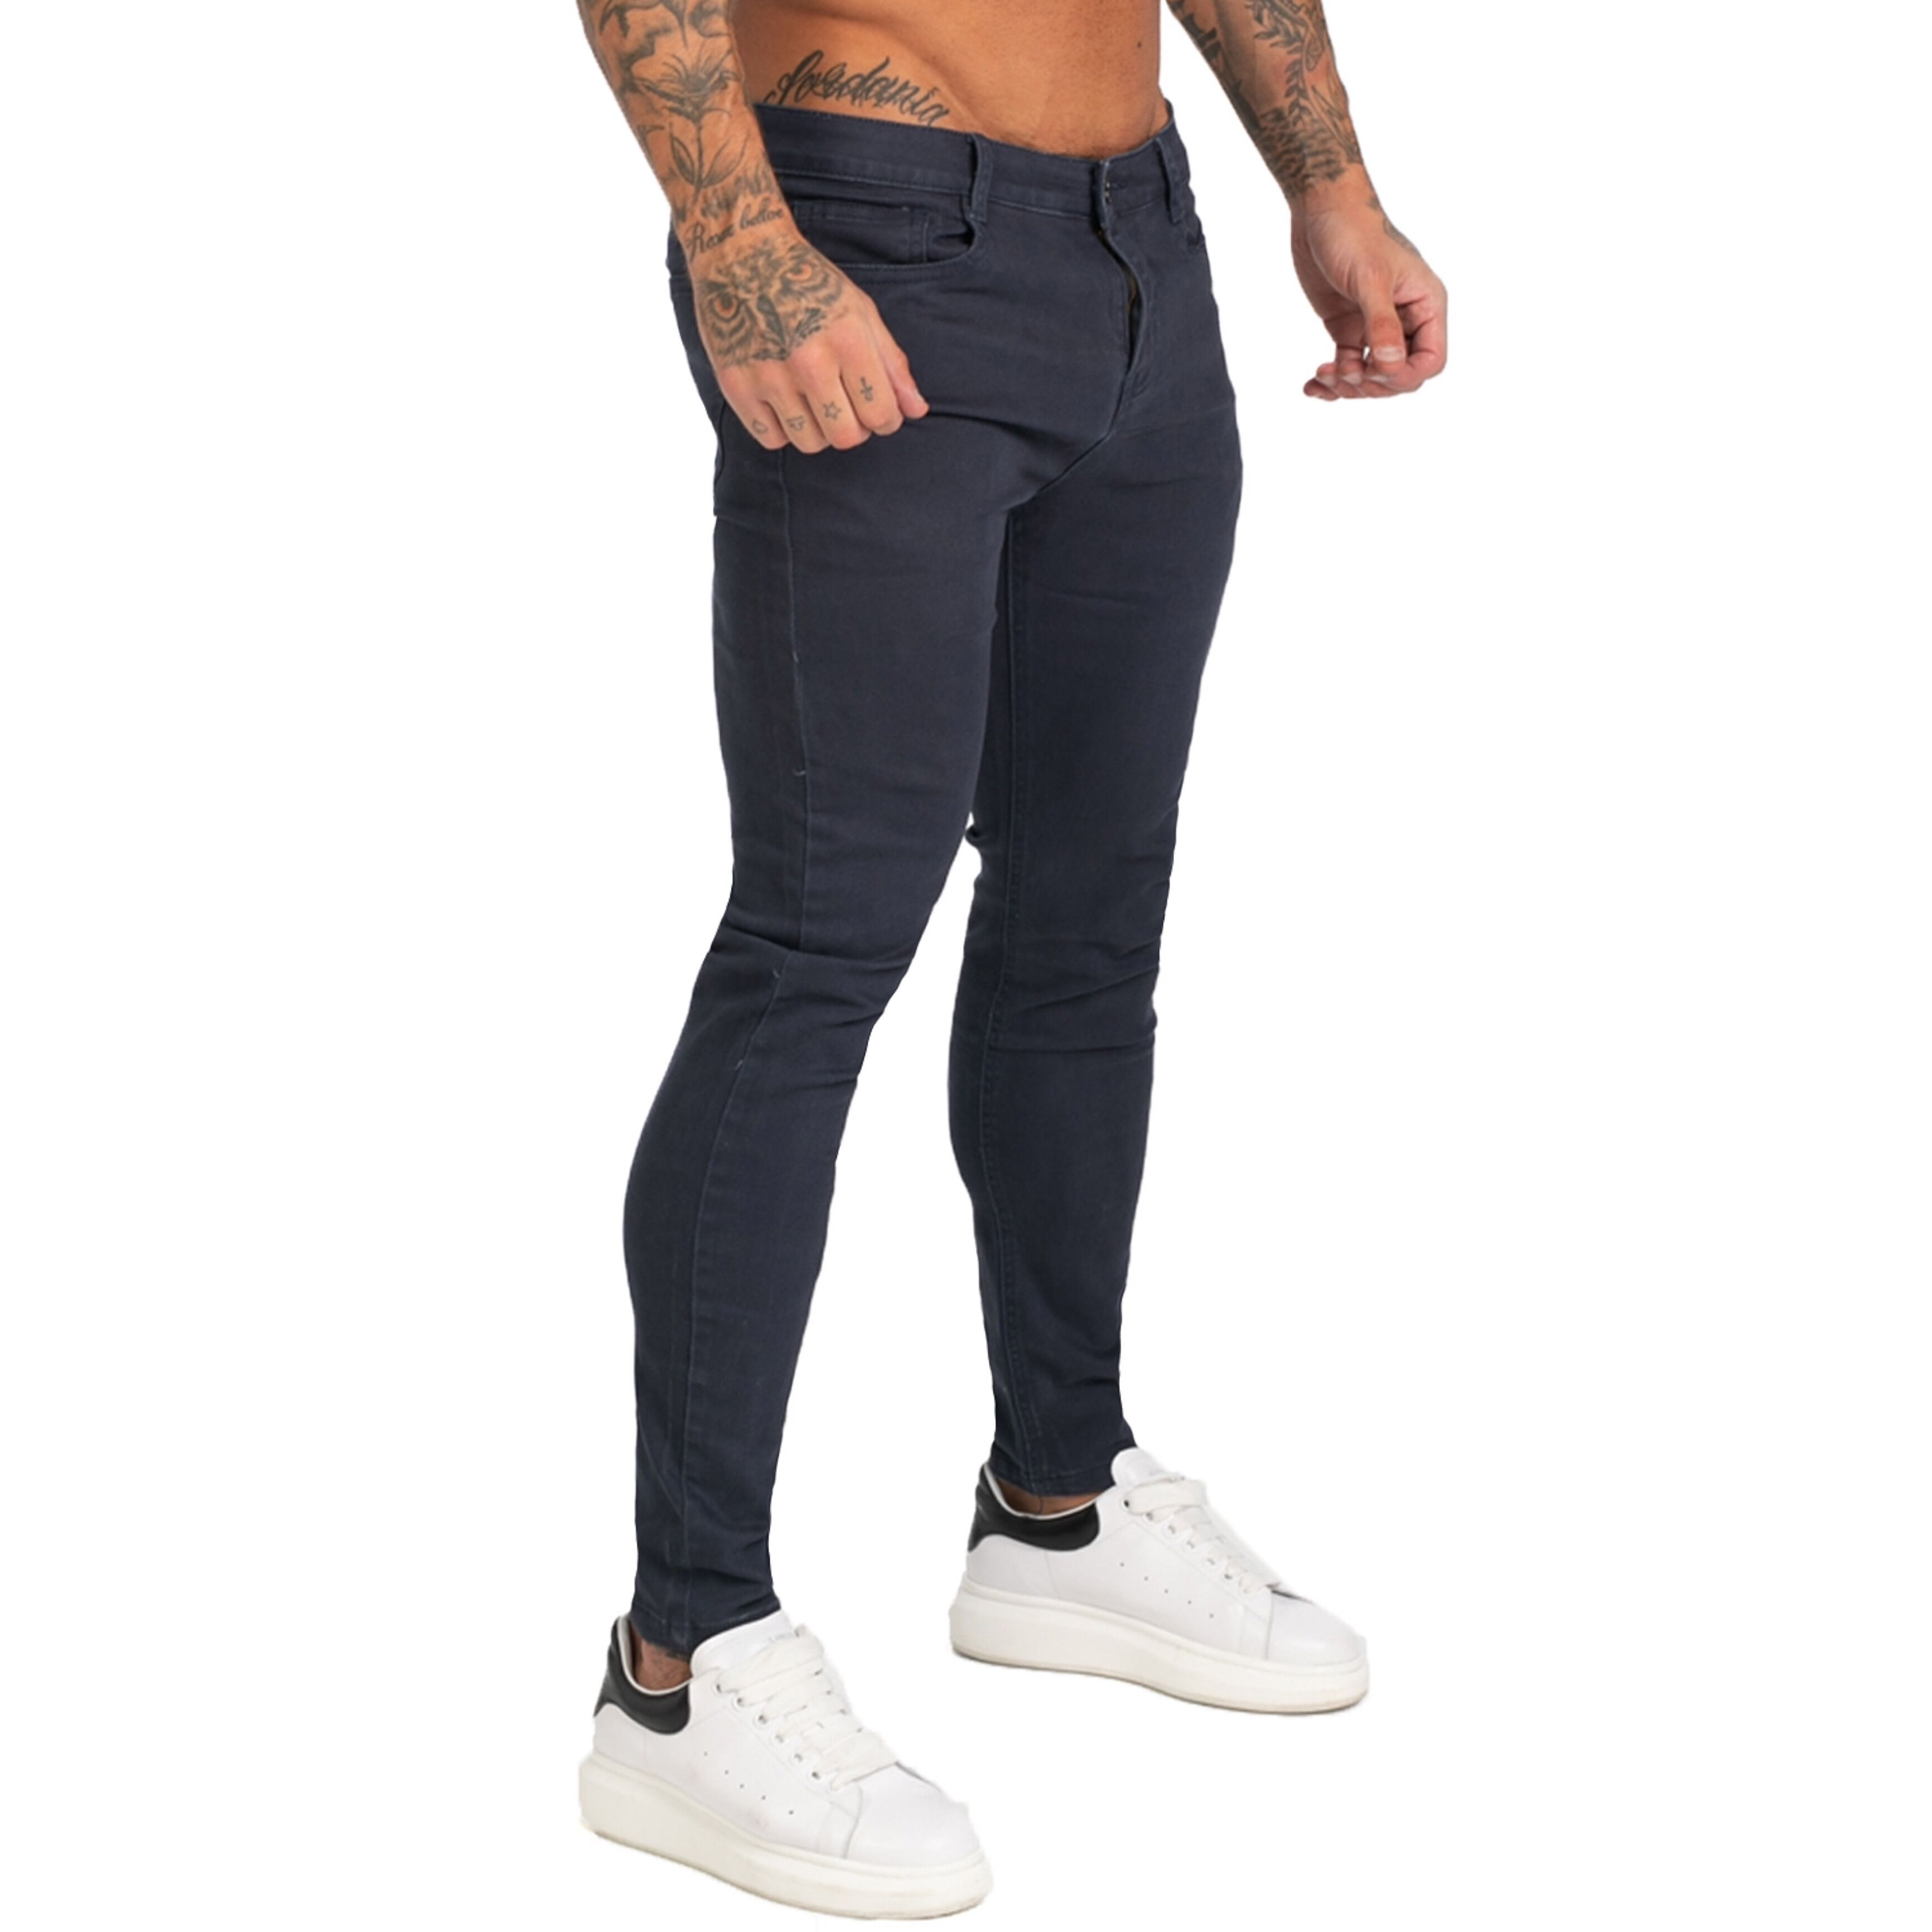 GINGTTO Mens Jeans Denim Stretchy Pants Super Skinny Fit Mens Jeans Elastic Waist Bestting For Athletic Body Hip Hop Zm172